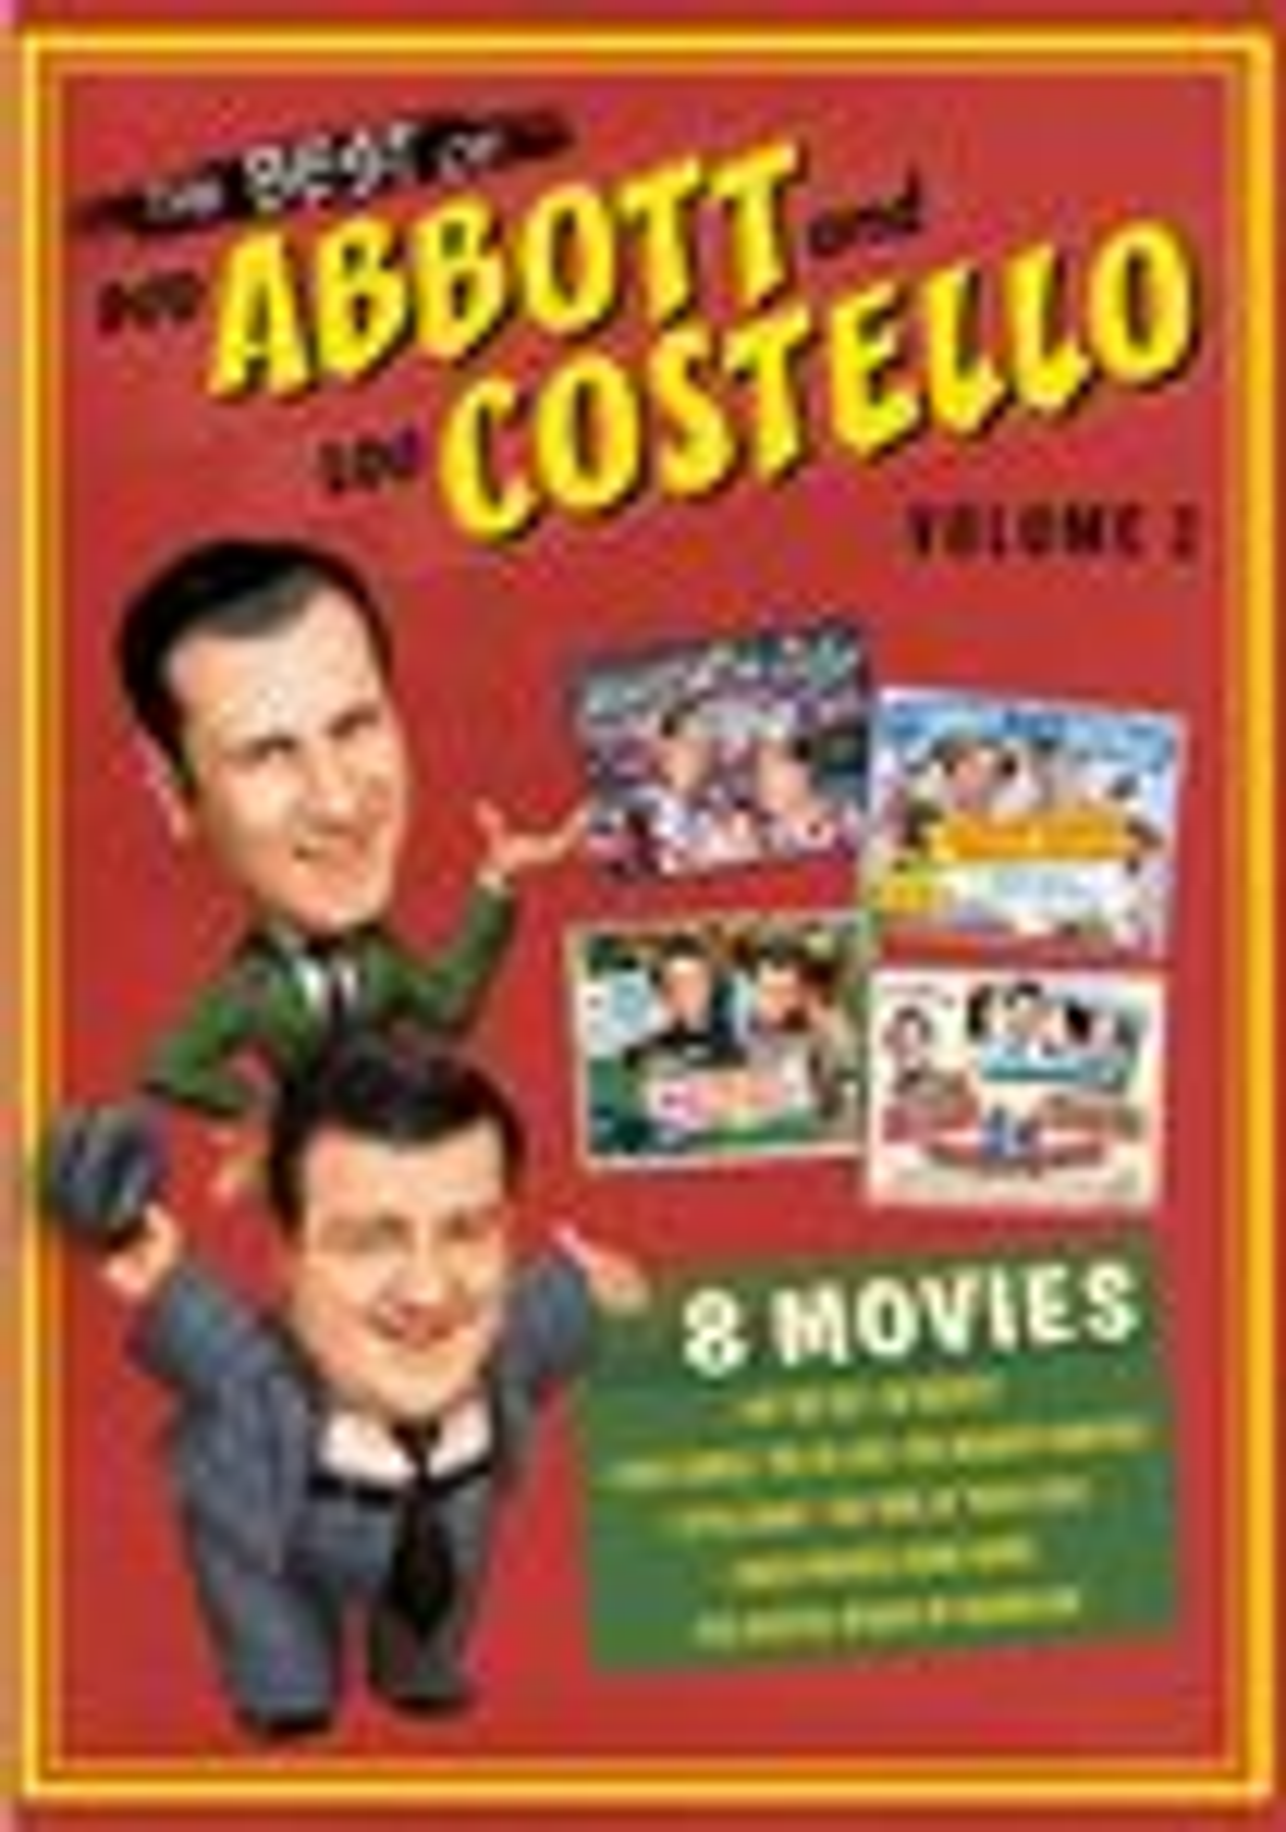 The Best Of Bud Abbott & Lou Cosetello: Volume 2 [4 Discs] (dvd) 6991469